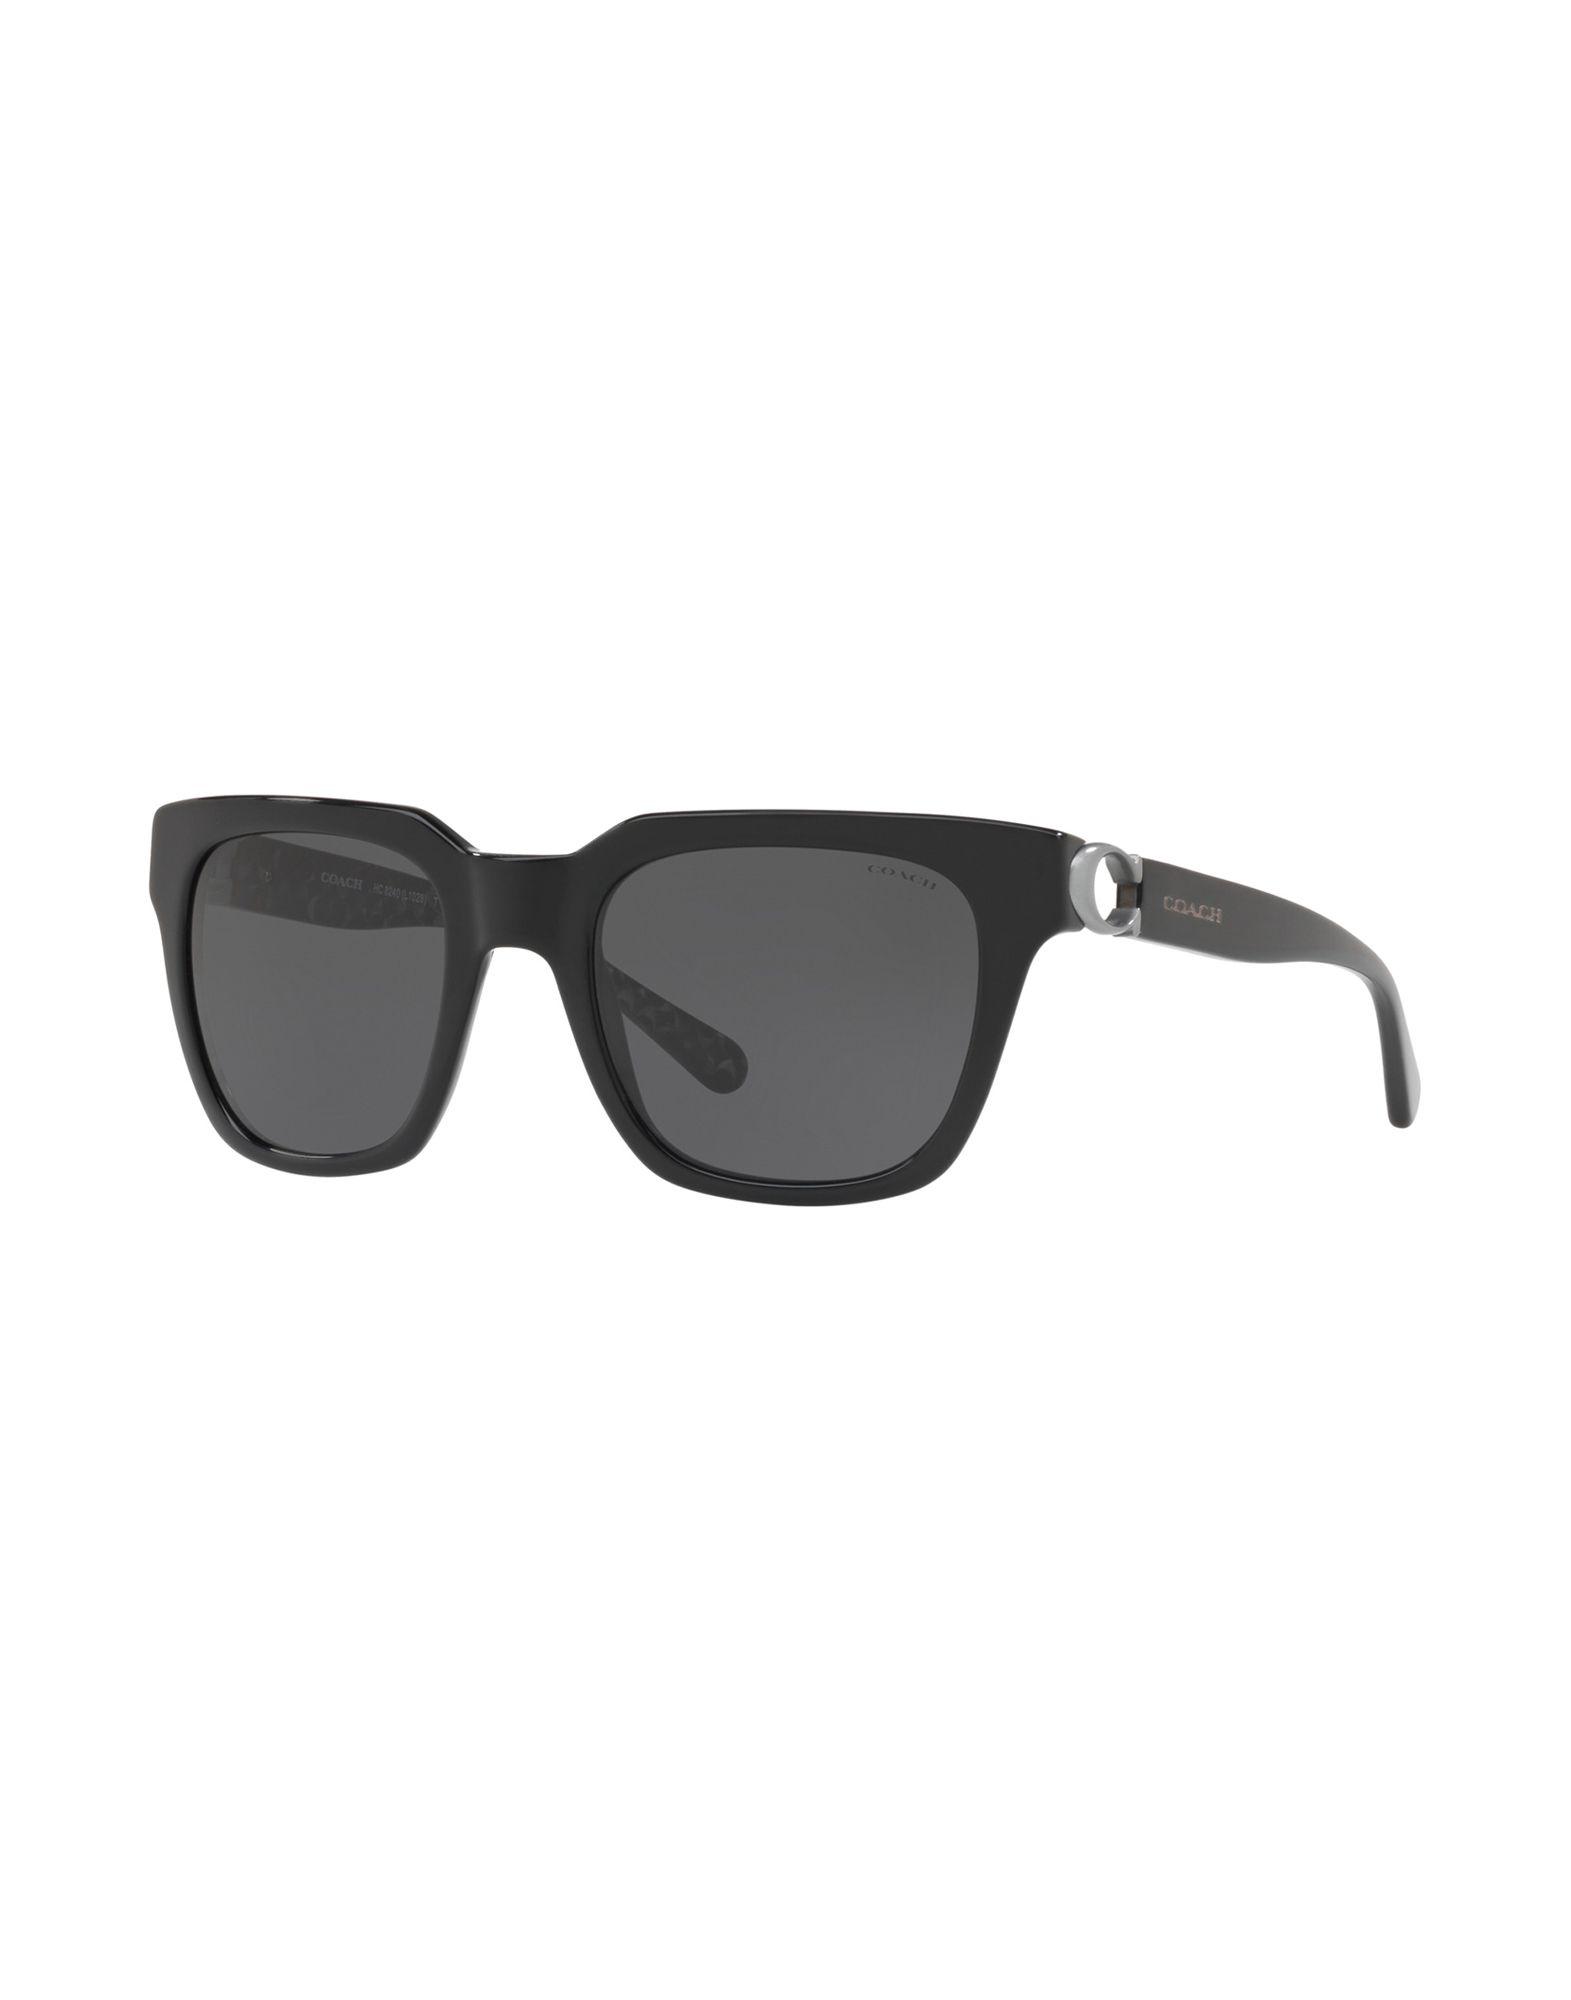 64101ad61e9e ... discount coach hc8240 l1028 sunglasses women coach sunglasses online on  yoox estonia 46585110qj 7b1b4 cdc4a